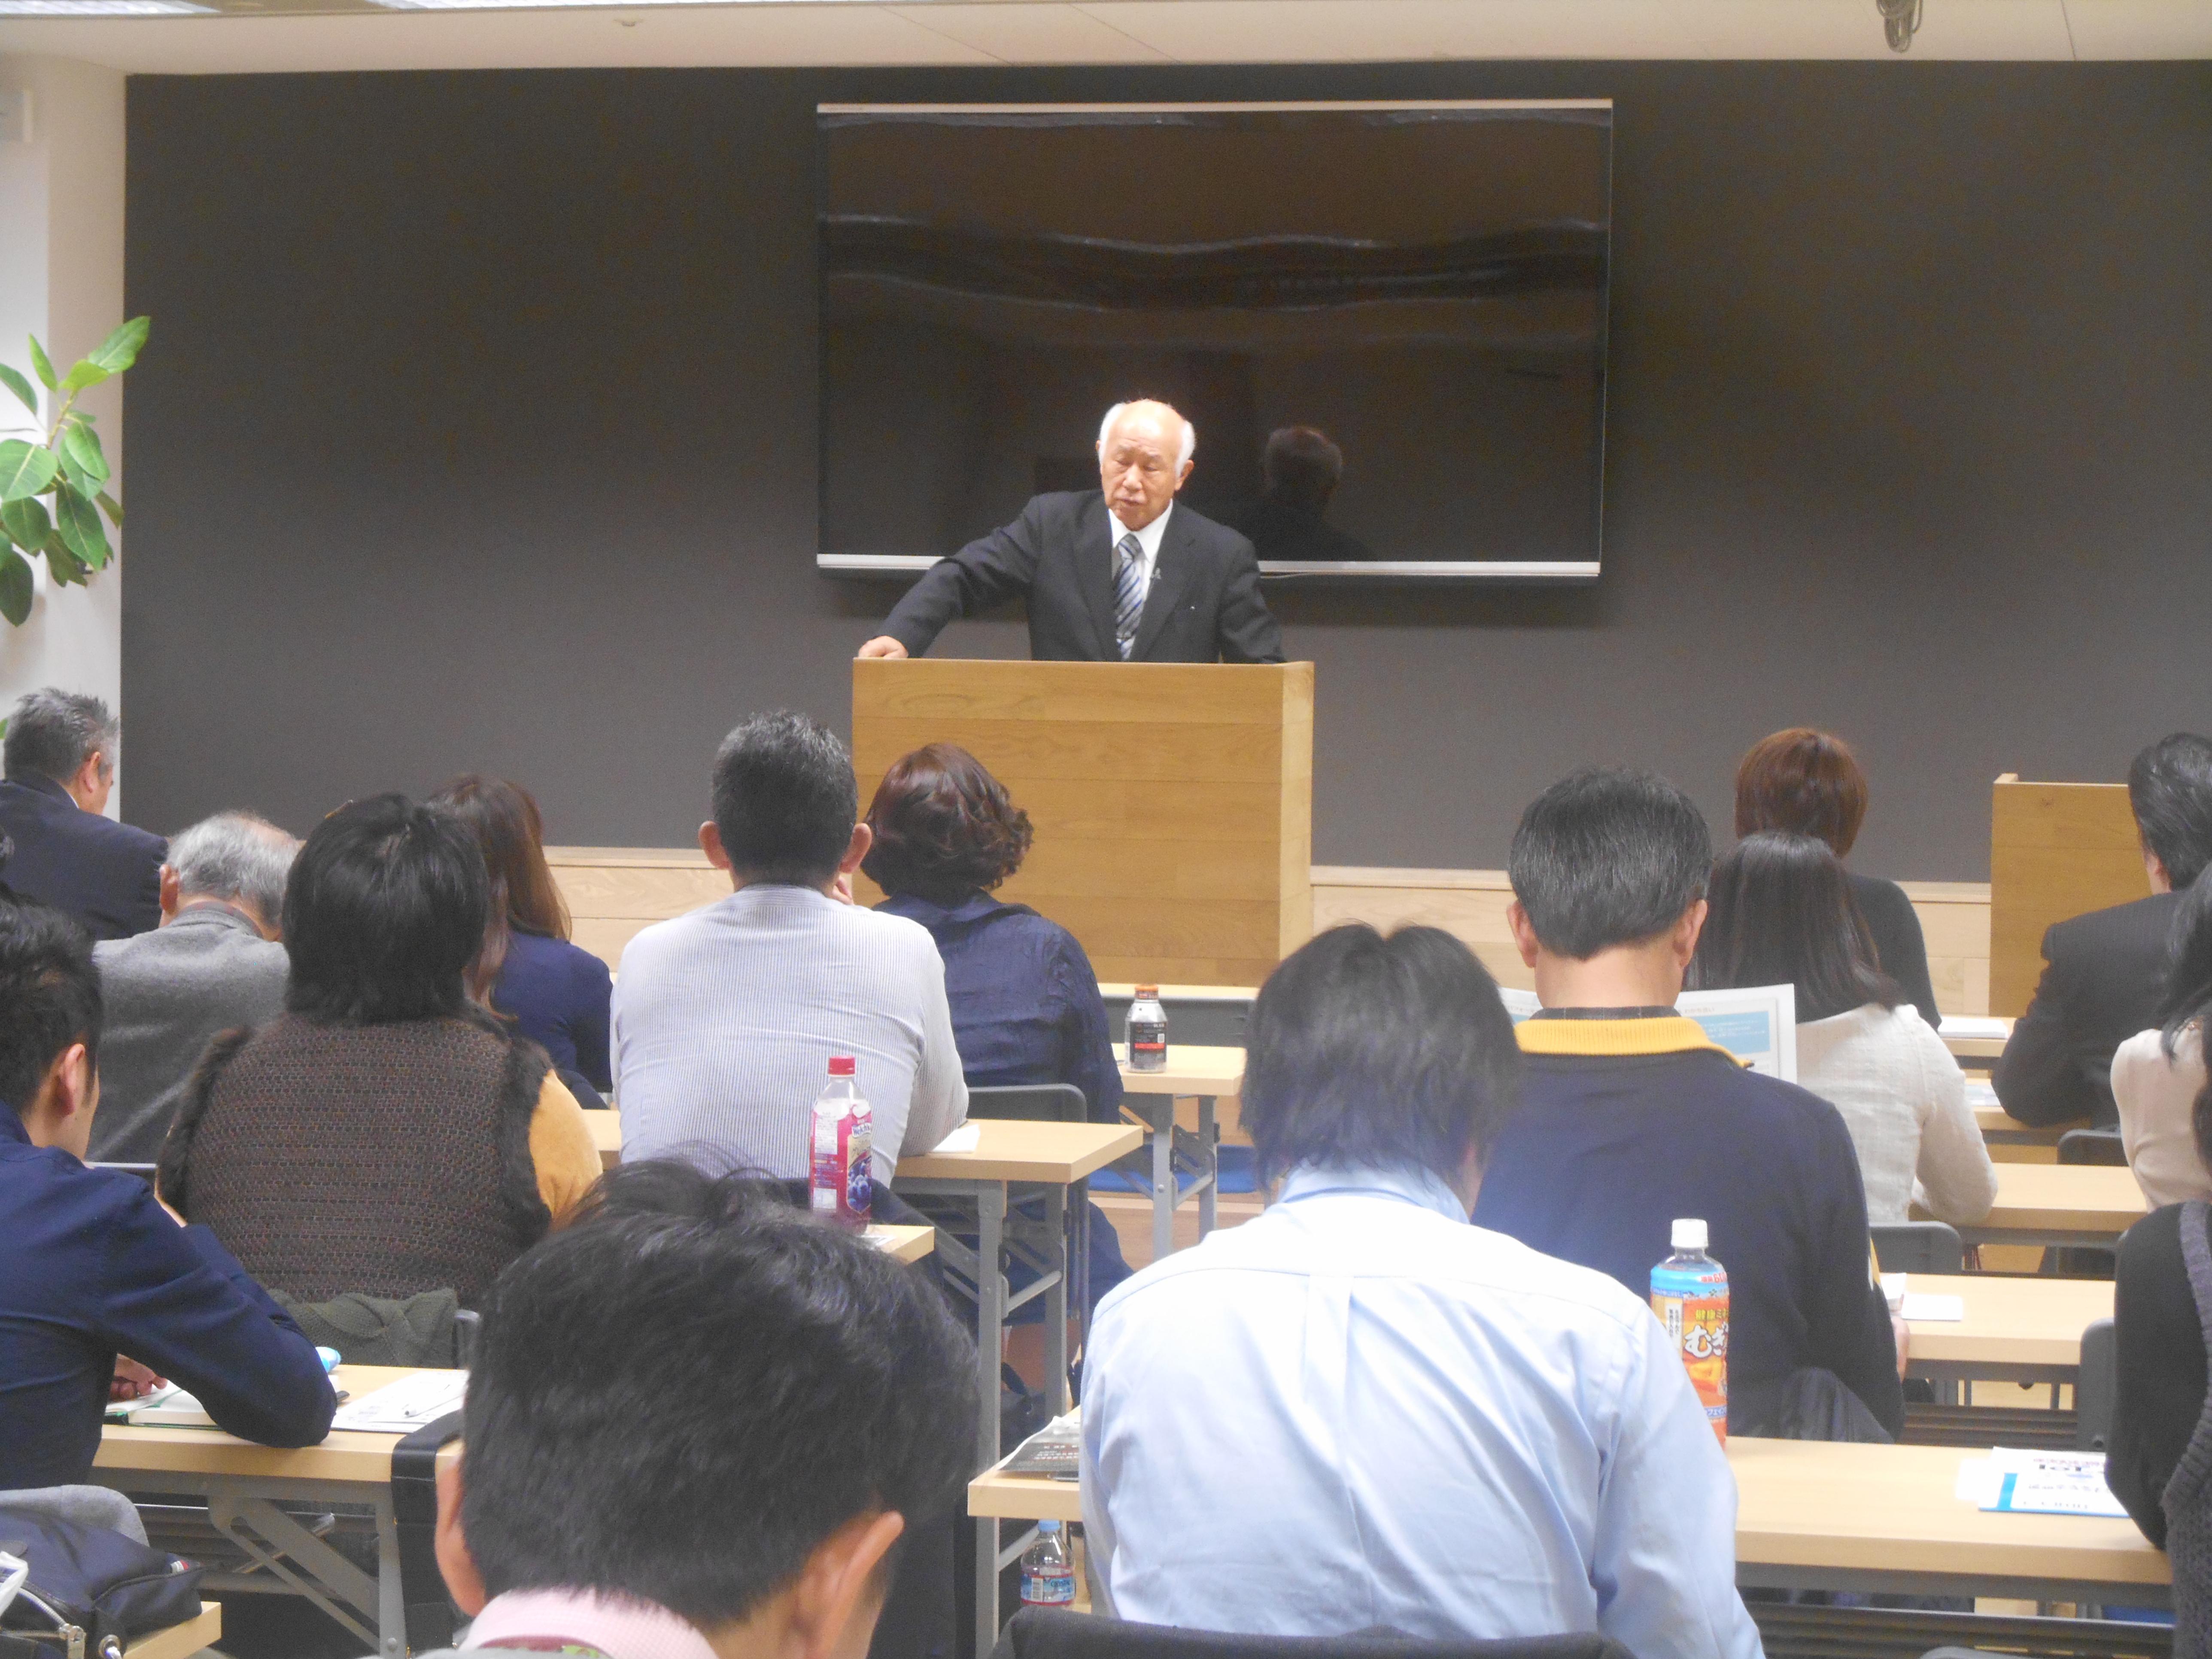 DSCN0455 1 - 平成30年度 東京思風塾 4月7日(土)「時代が問題をつくり、問題が人物をつくる」